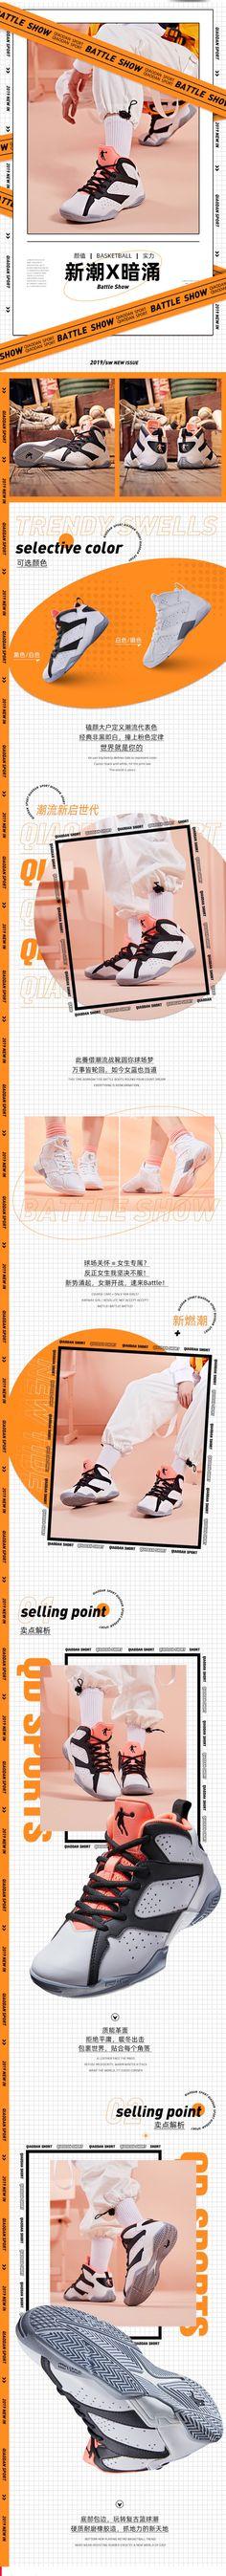 Web Design, Game Ui Design, Layout Inspiration, Graphic Design Inspiration, Web Layout, Layout Design, Chinese New Year Design, Best Banner Design, Event Branding